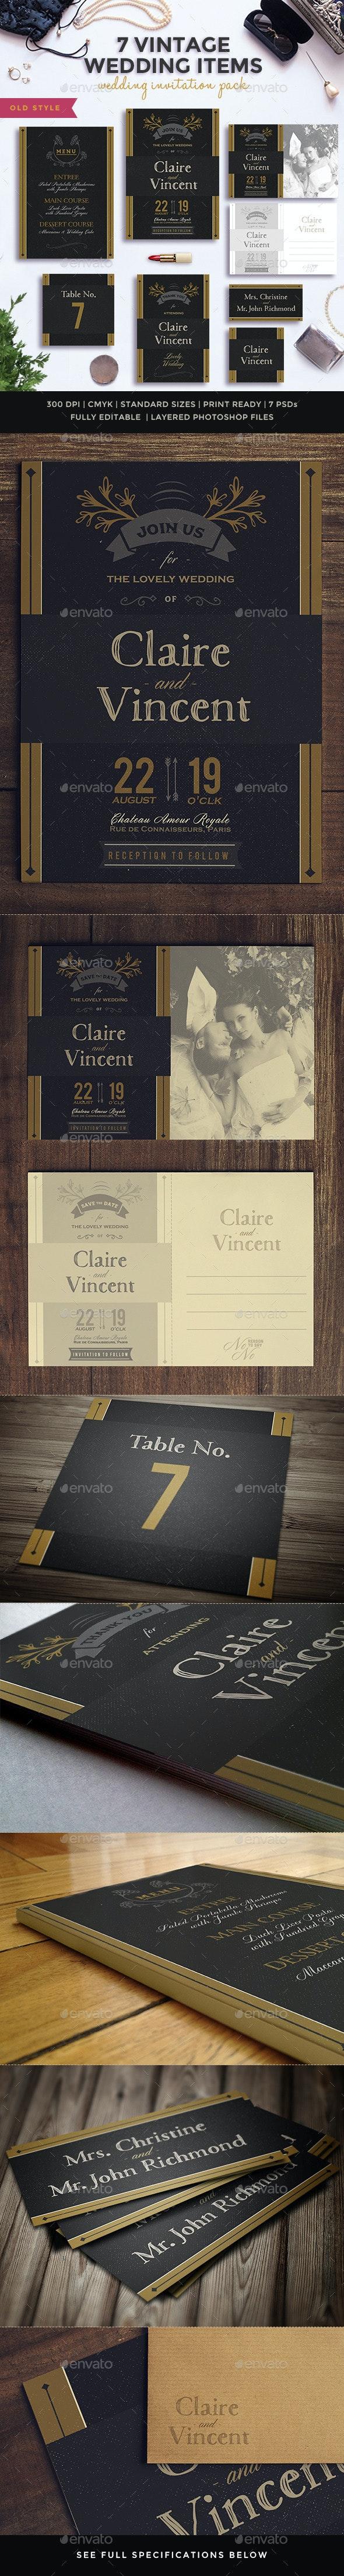 7 Vintage Items - Wedding Pack IV - Weddings Cards & Invites